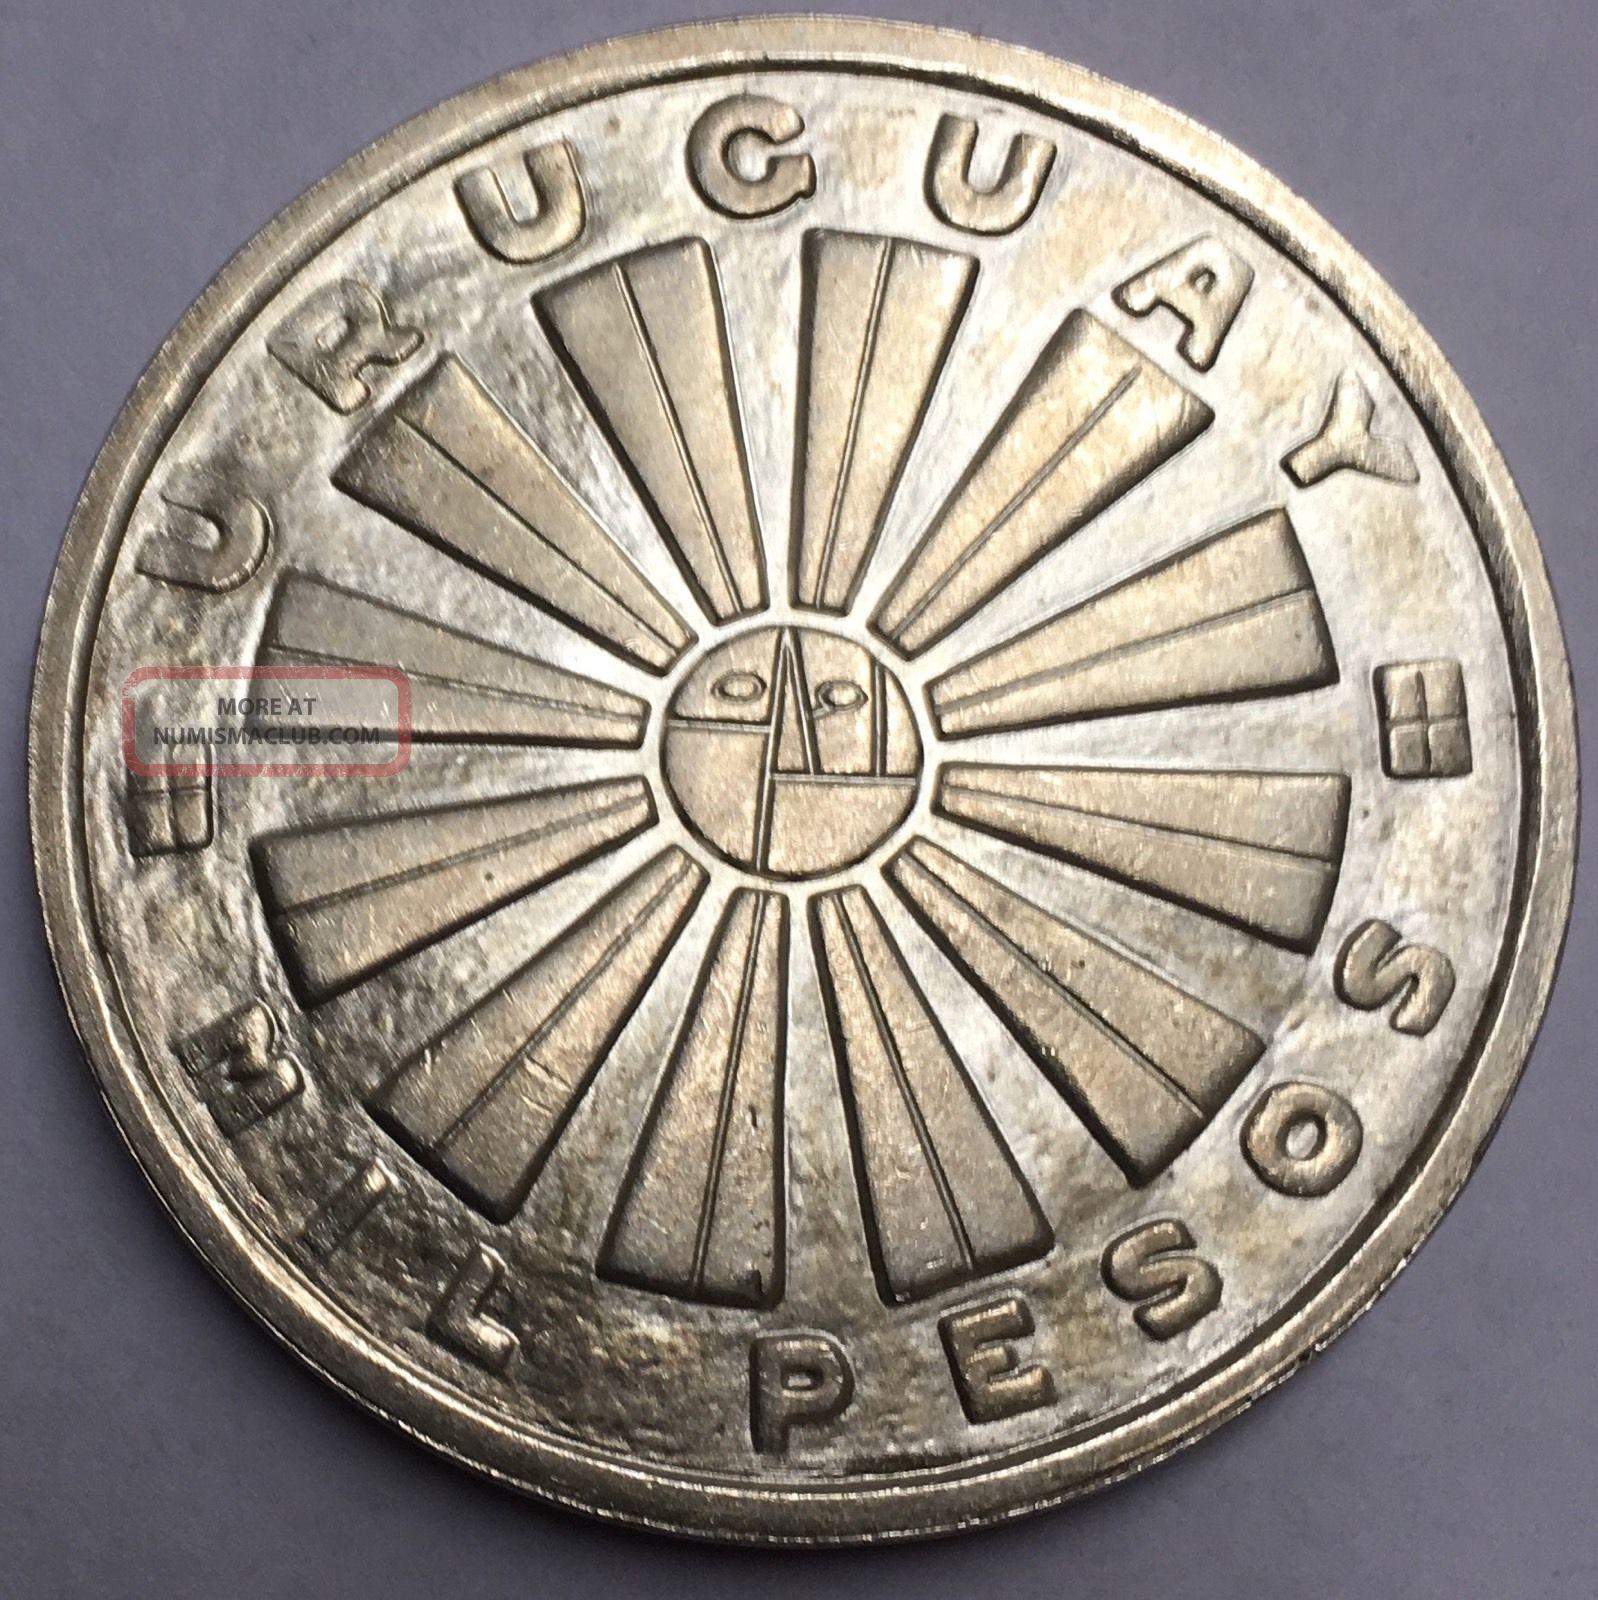 South American Republic Of Uruguay 1969 1000 Pesos Silver Crown Coin. South America photo